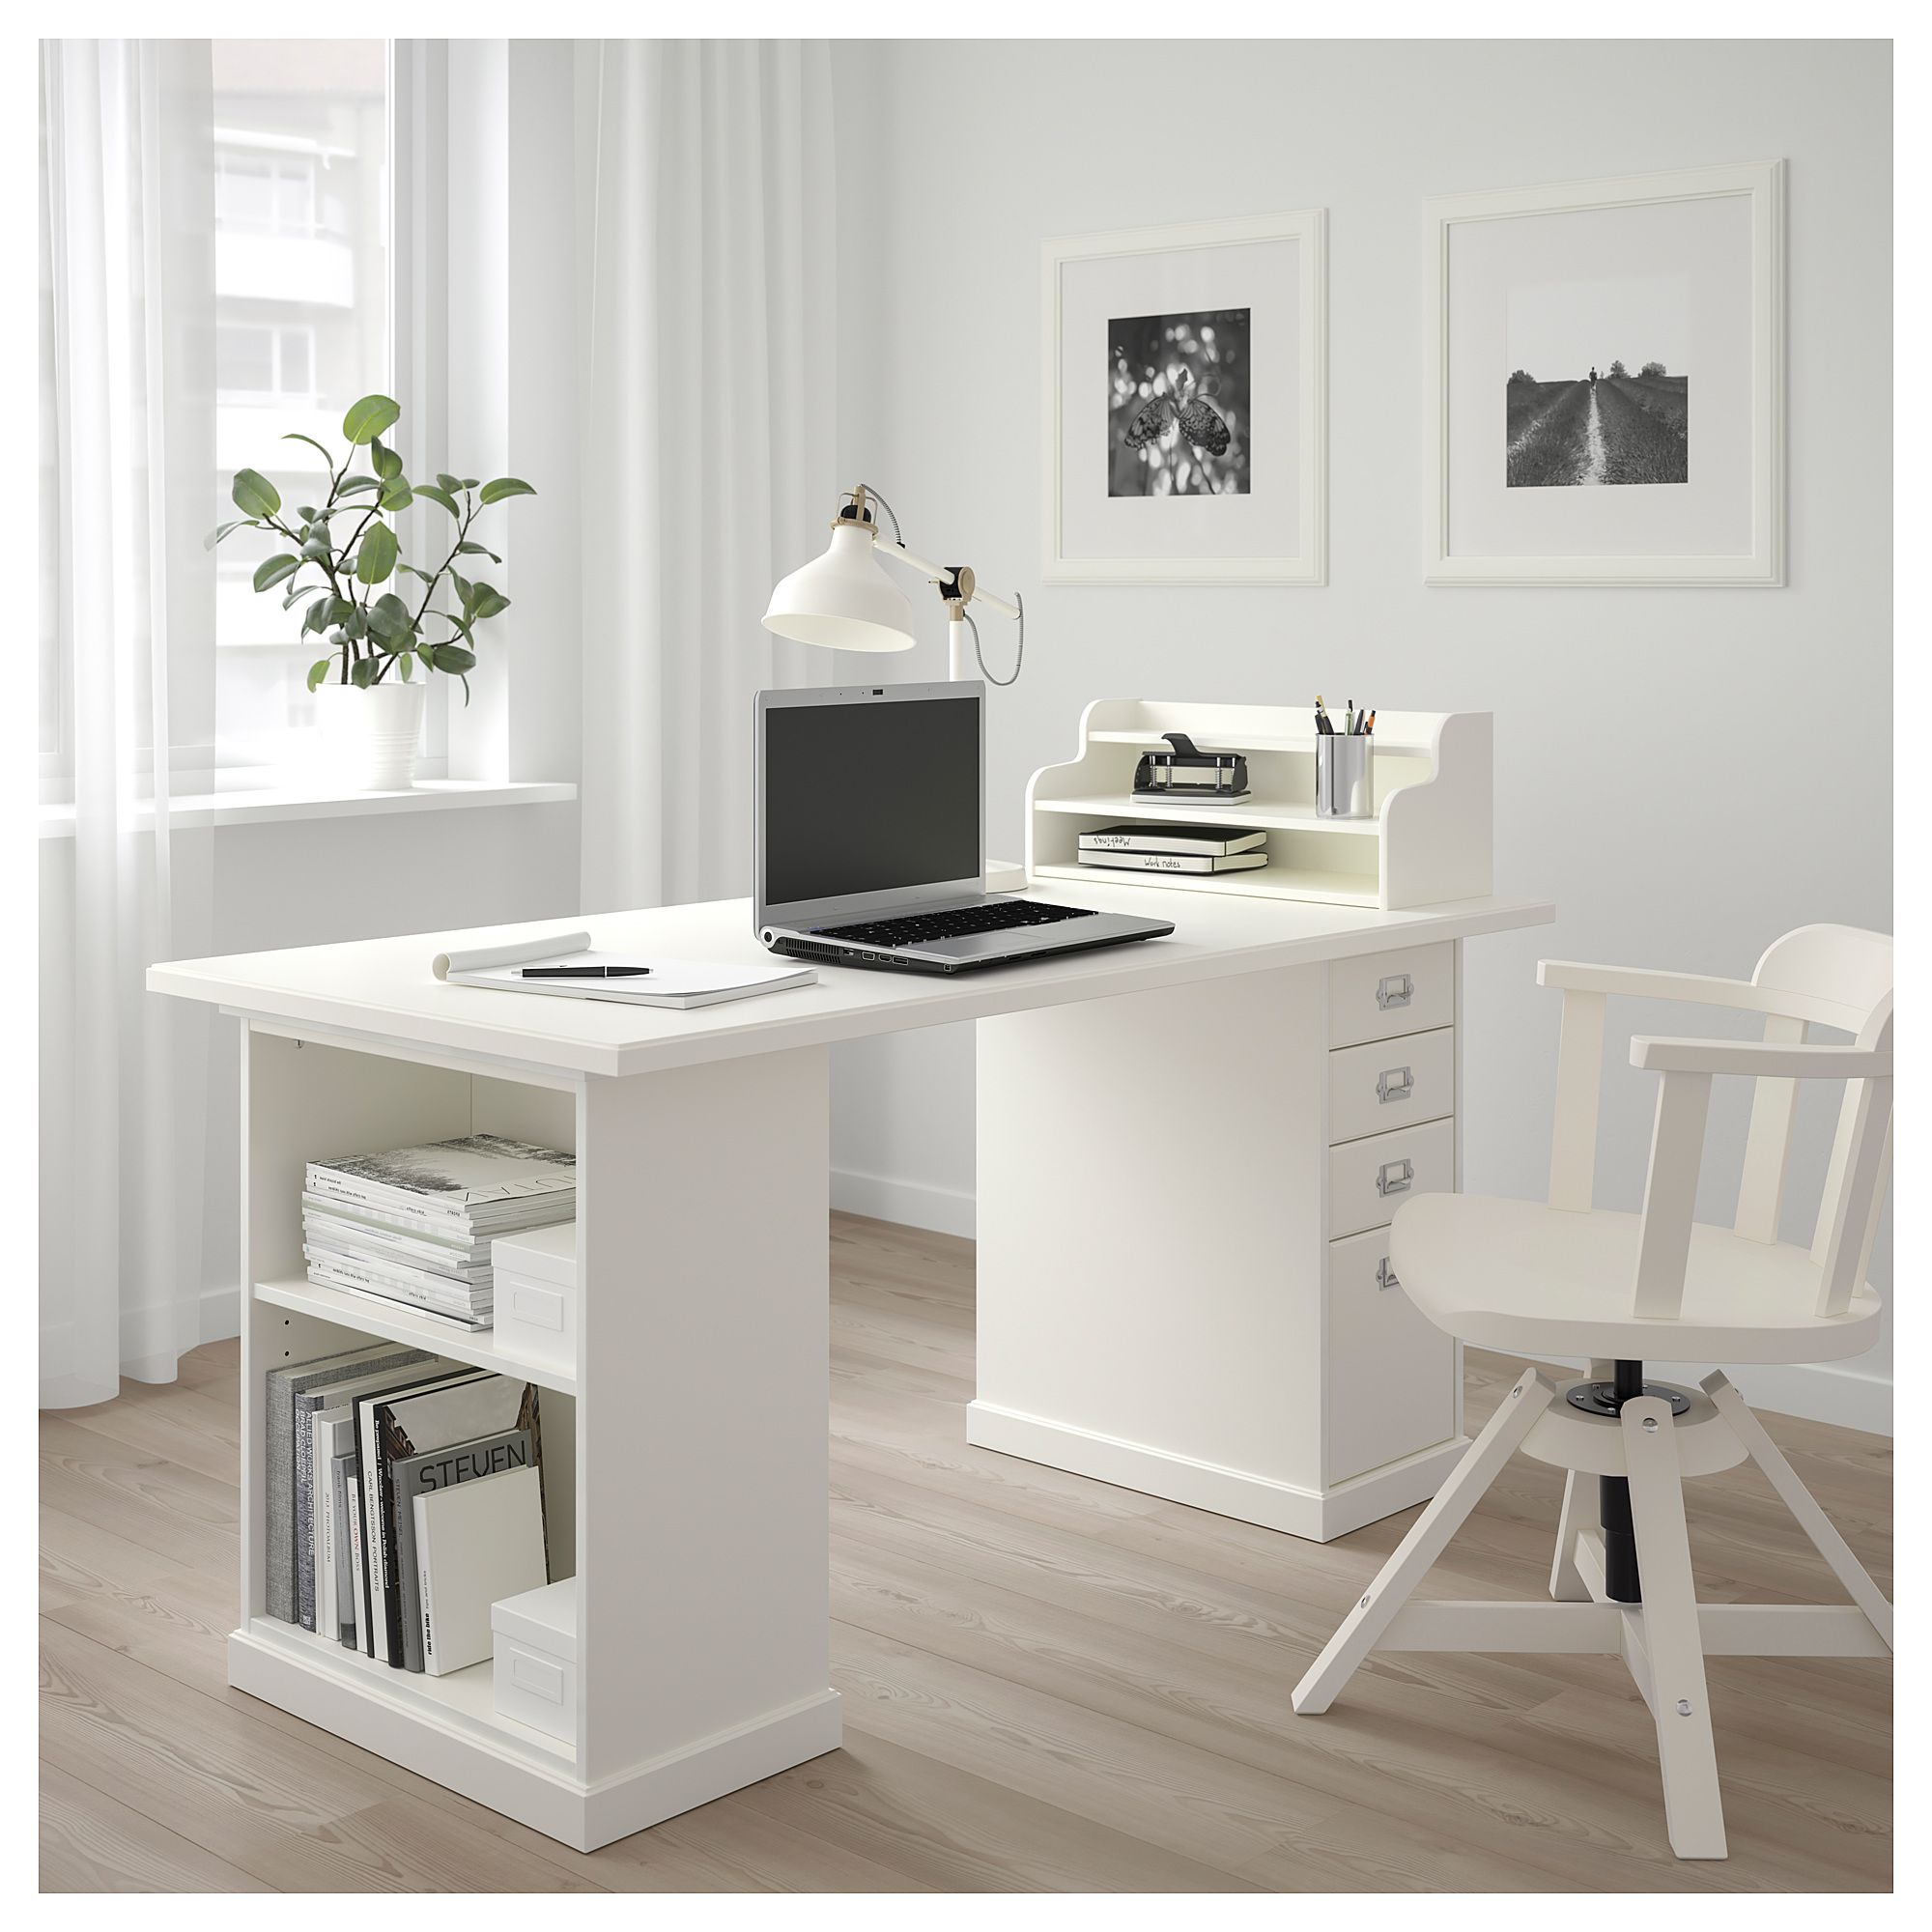 Diy sewing table ikea ikea  klimpen table gray light  home office  pinterest  ikea